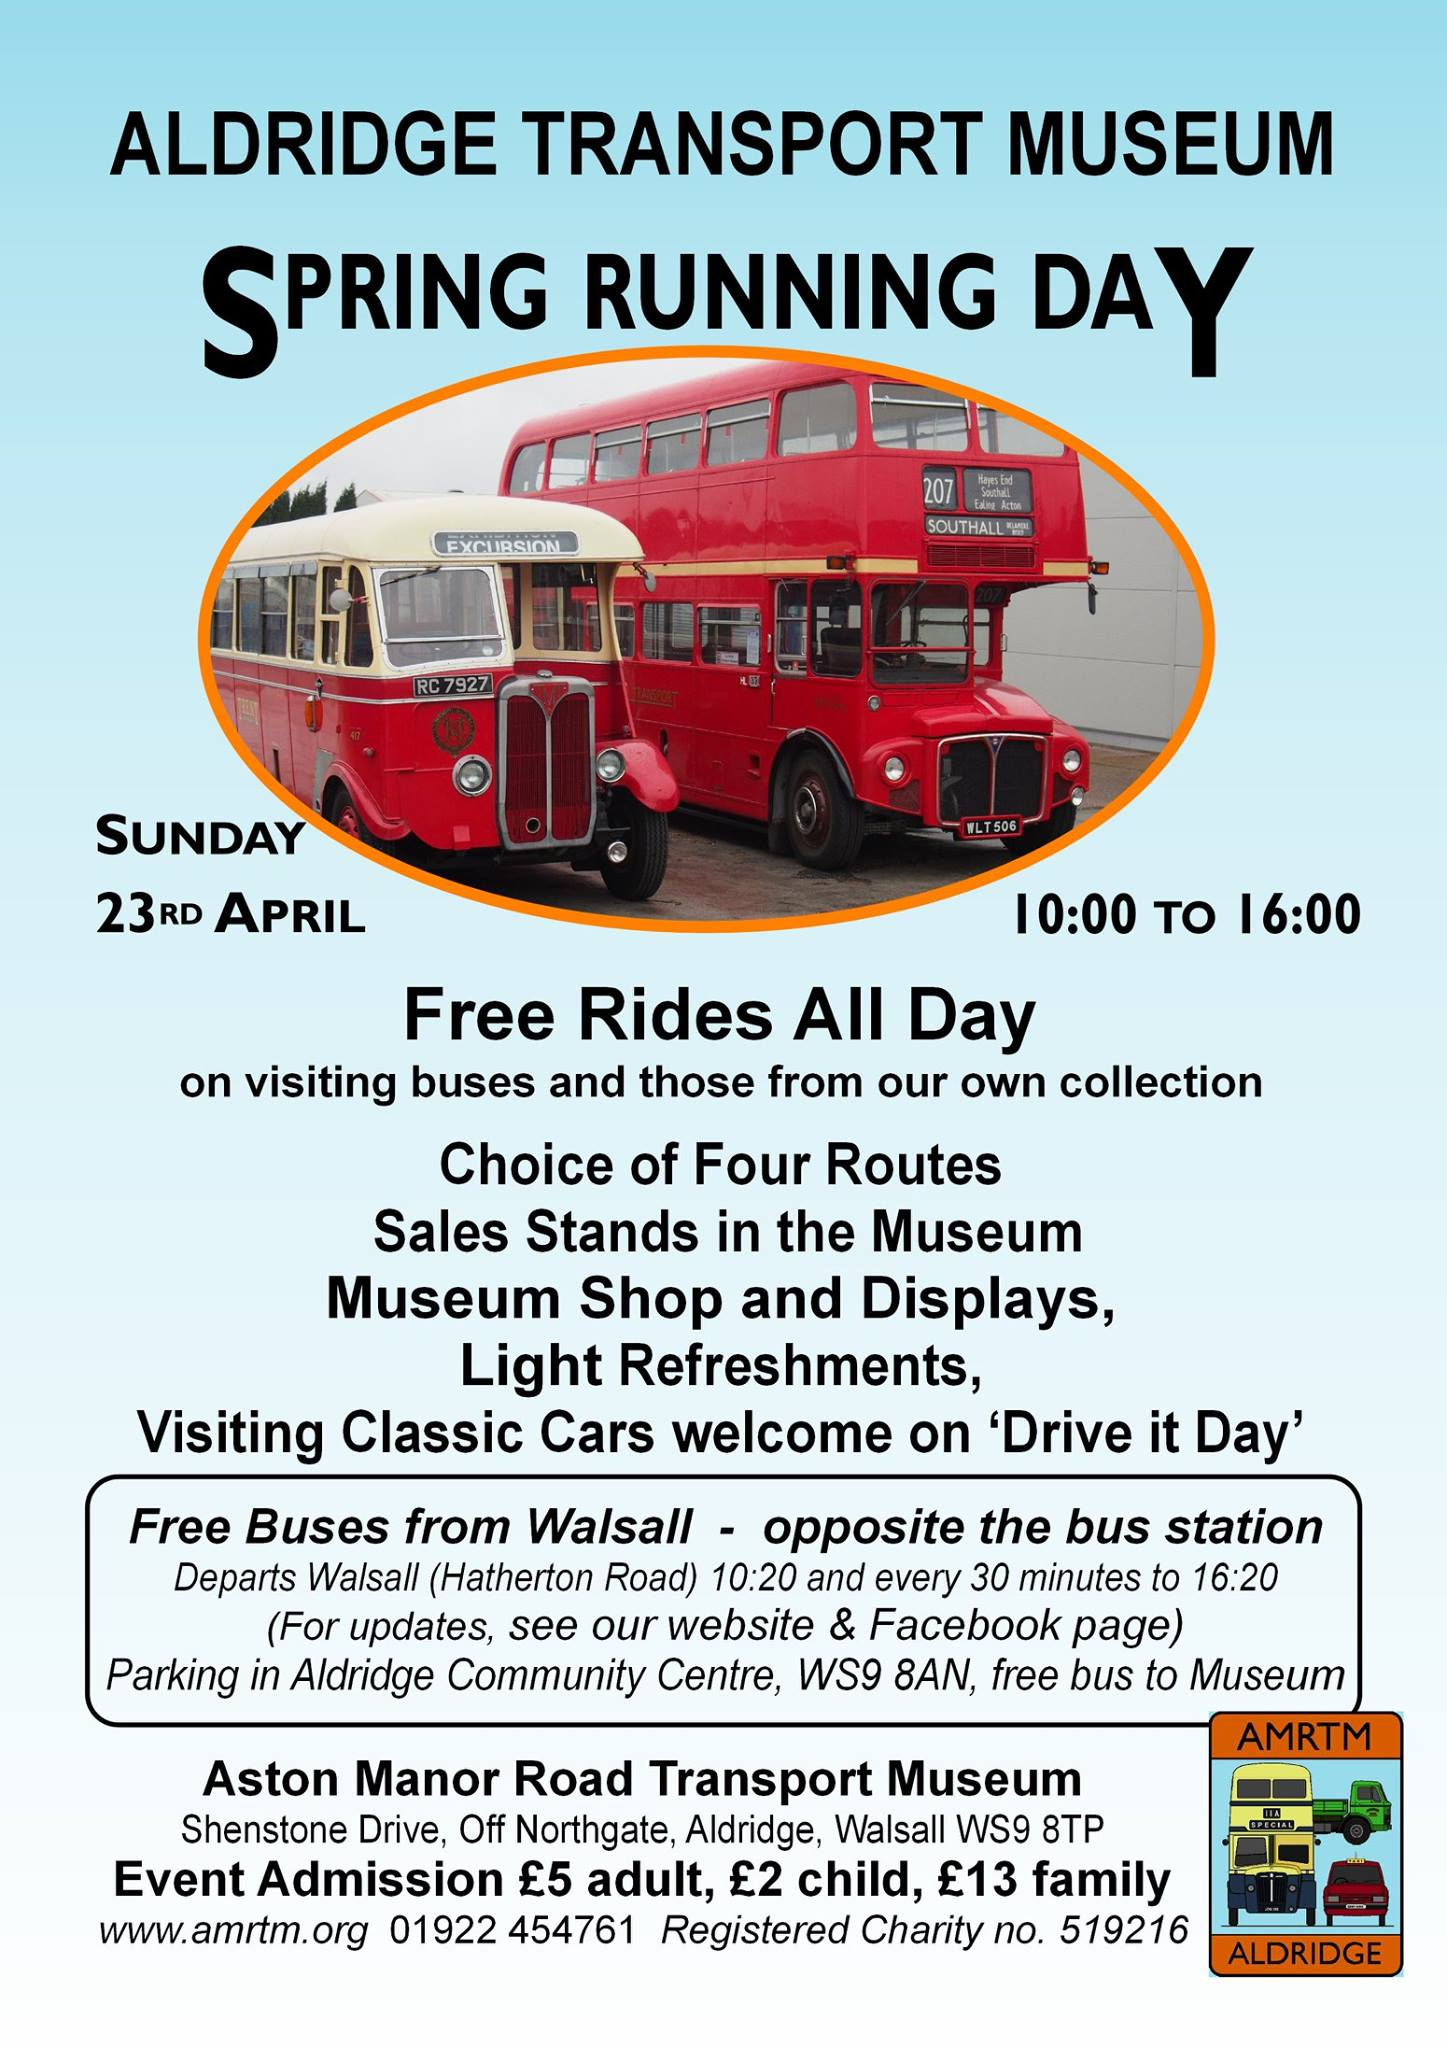 Aston Manor Transport Museum In Aldridge Spring Running Day This Sunday